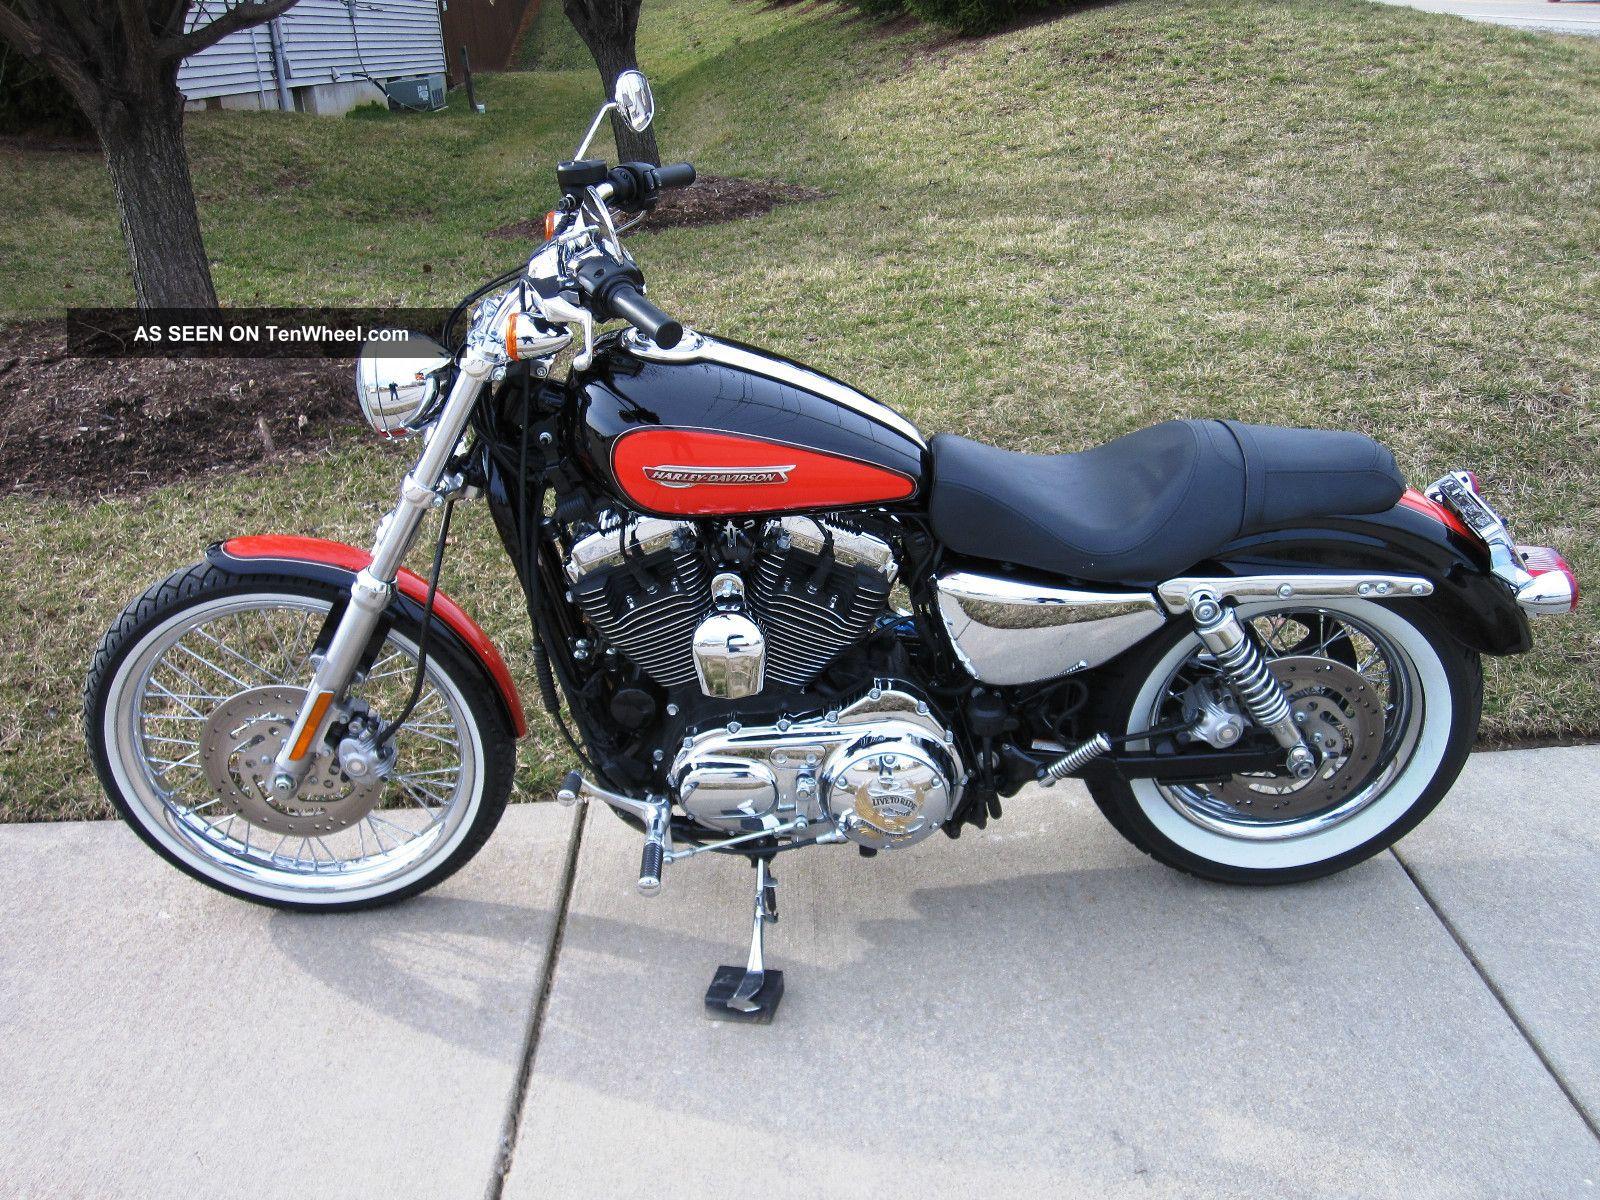 2009 Harley Davidson Sportster 1200 Custom